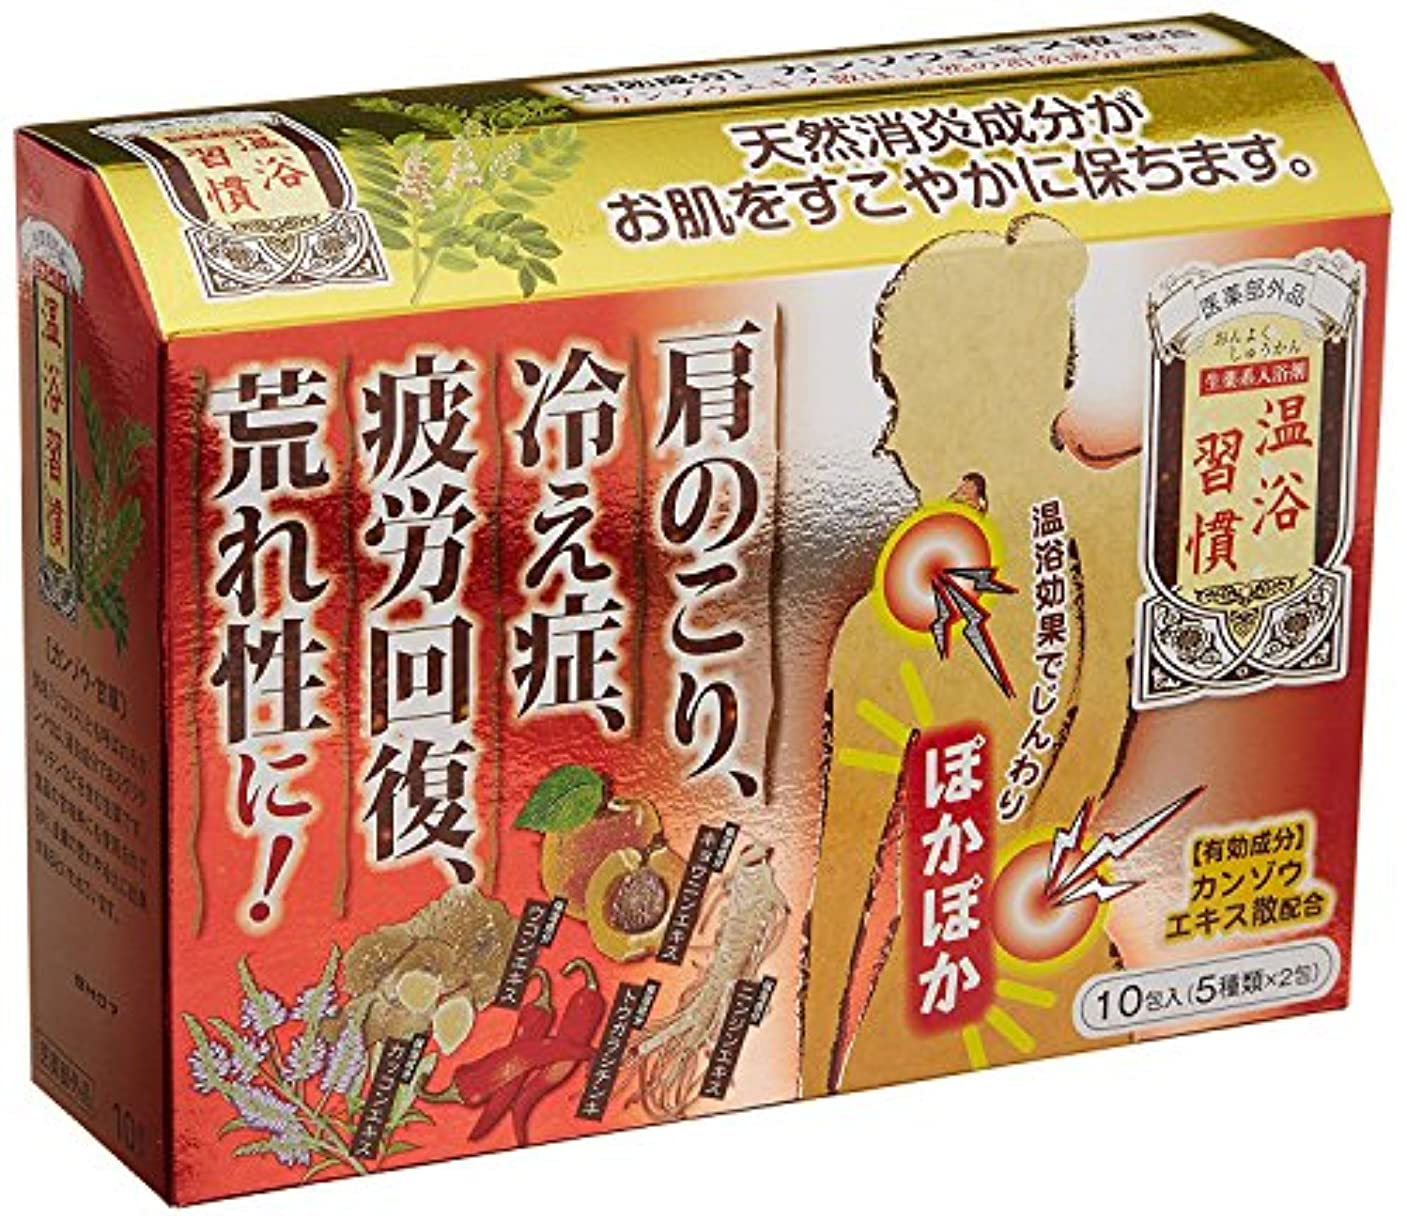 護衛曲アボート薬用入浴剤 温浴習慣 10包入 30g×10包 (医薬部外品) 【4点セット】